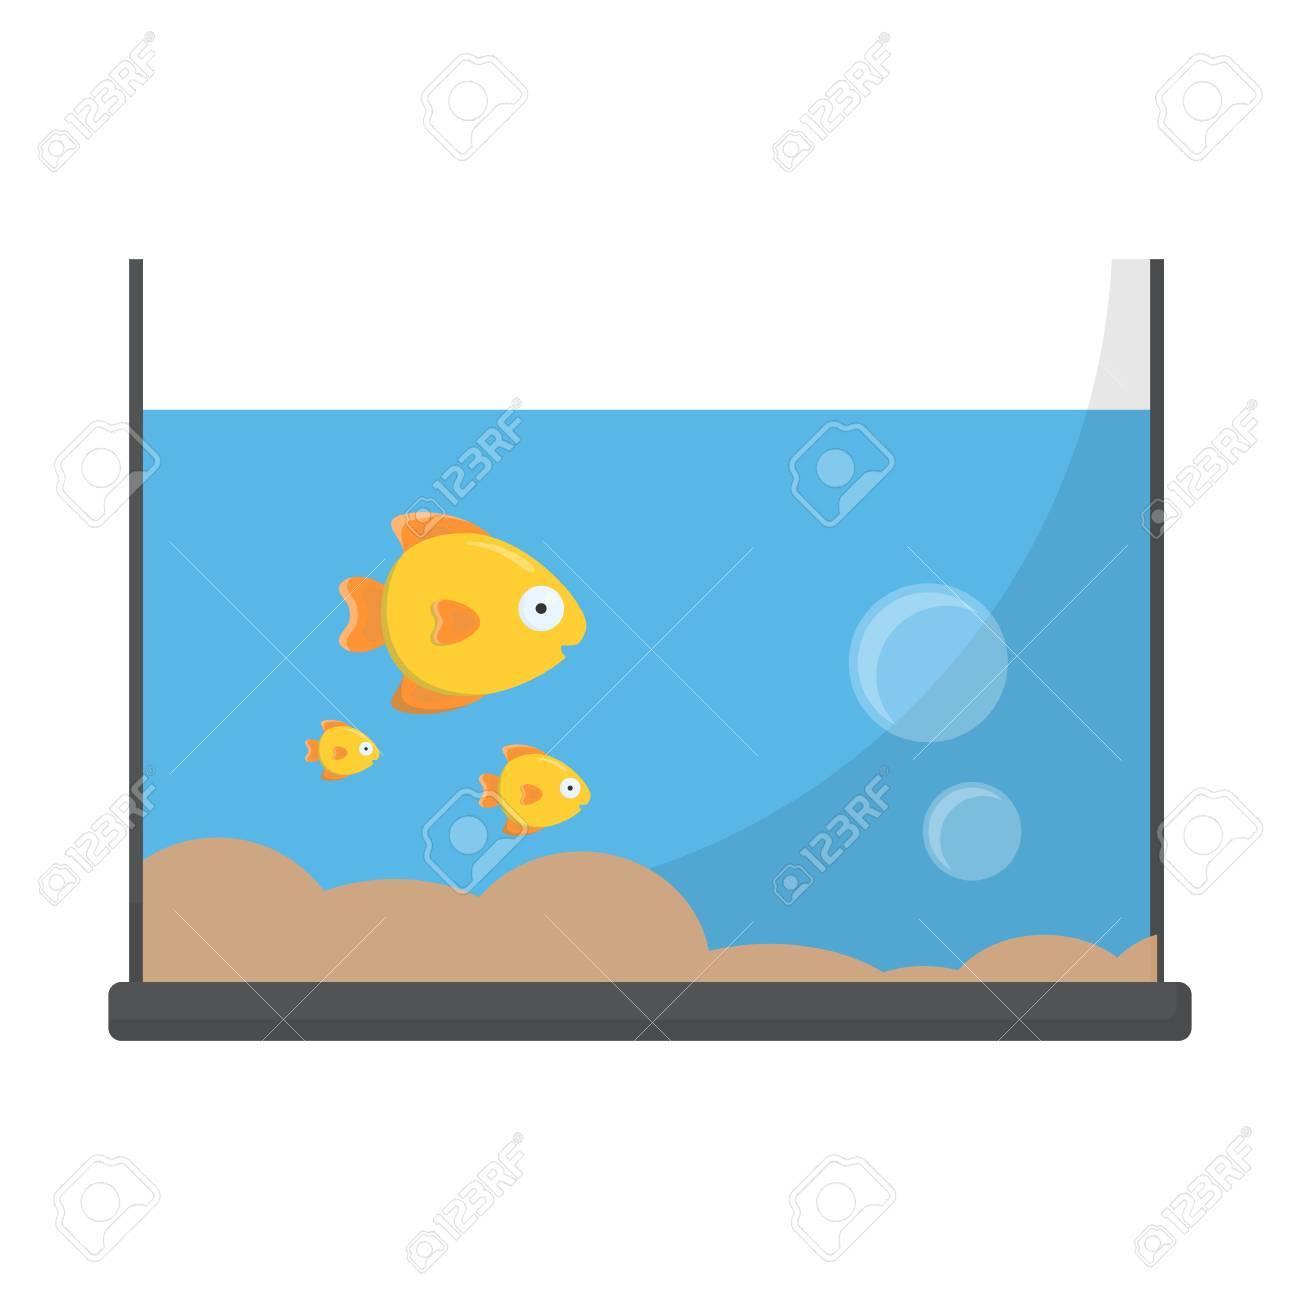 Aquarium Cartoon Icon Illustration For Web And Mobile